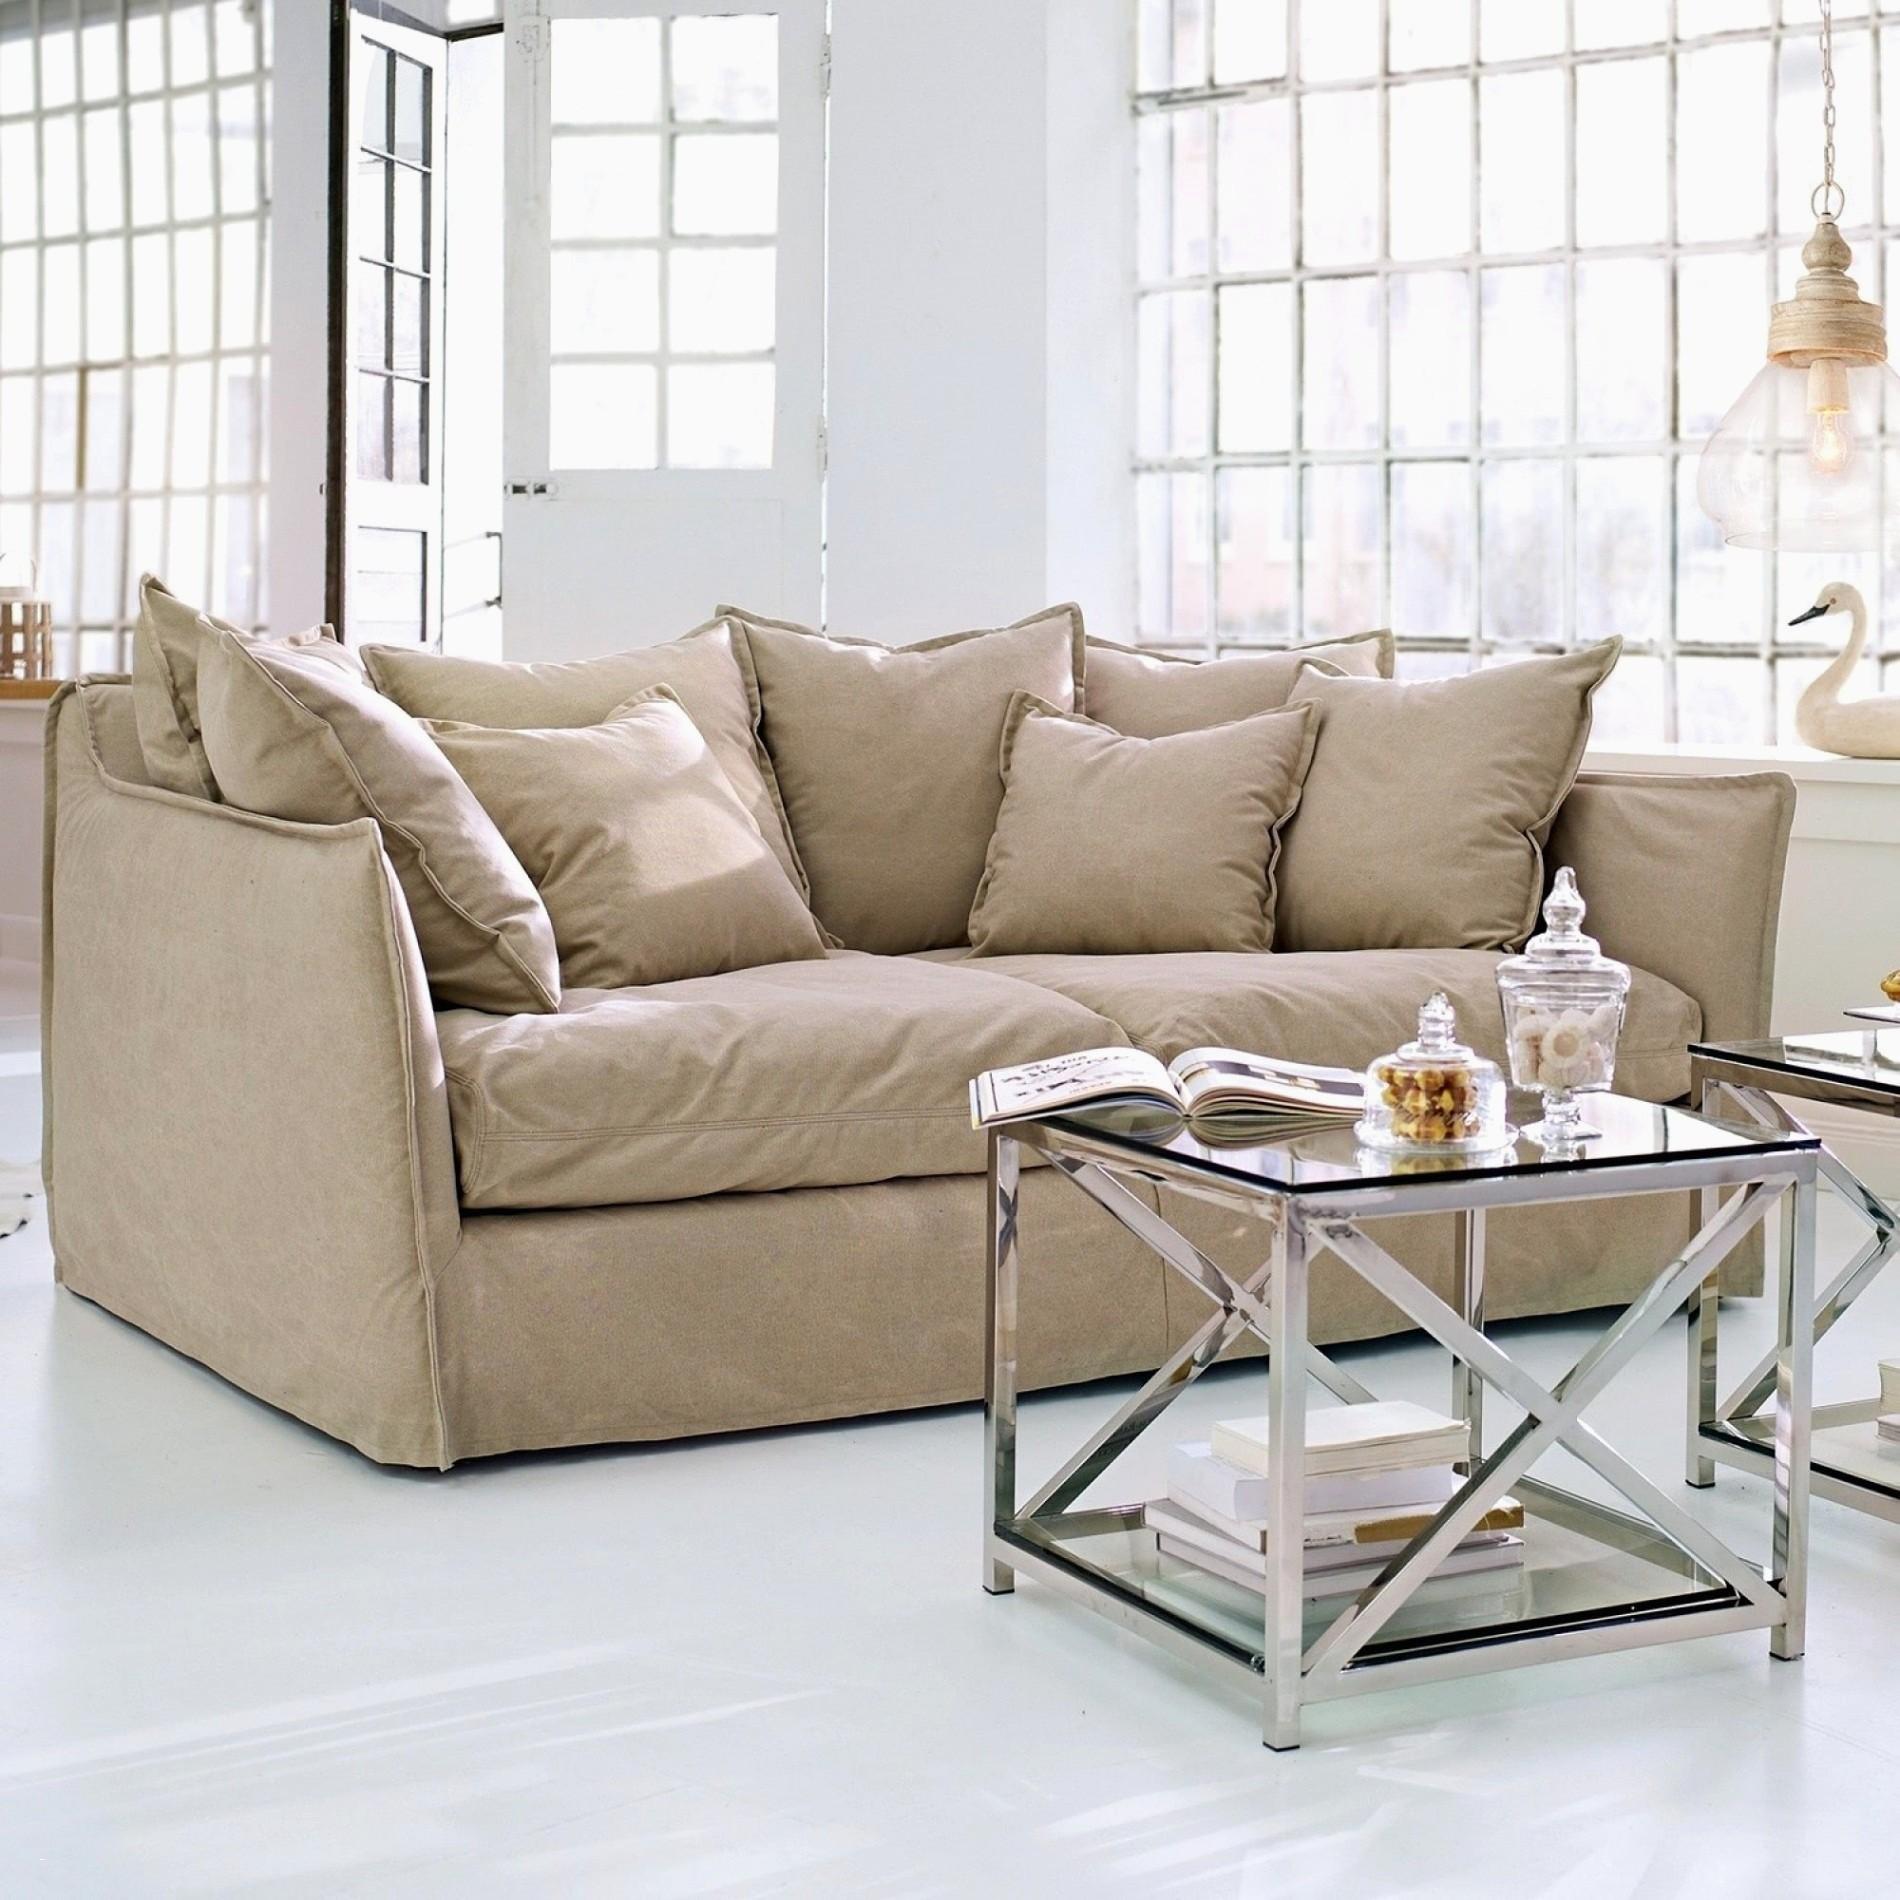 Big Sofa Günstig  45 Luxus Ideen Big sofa Günstig